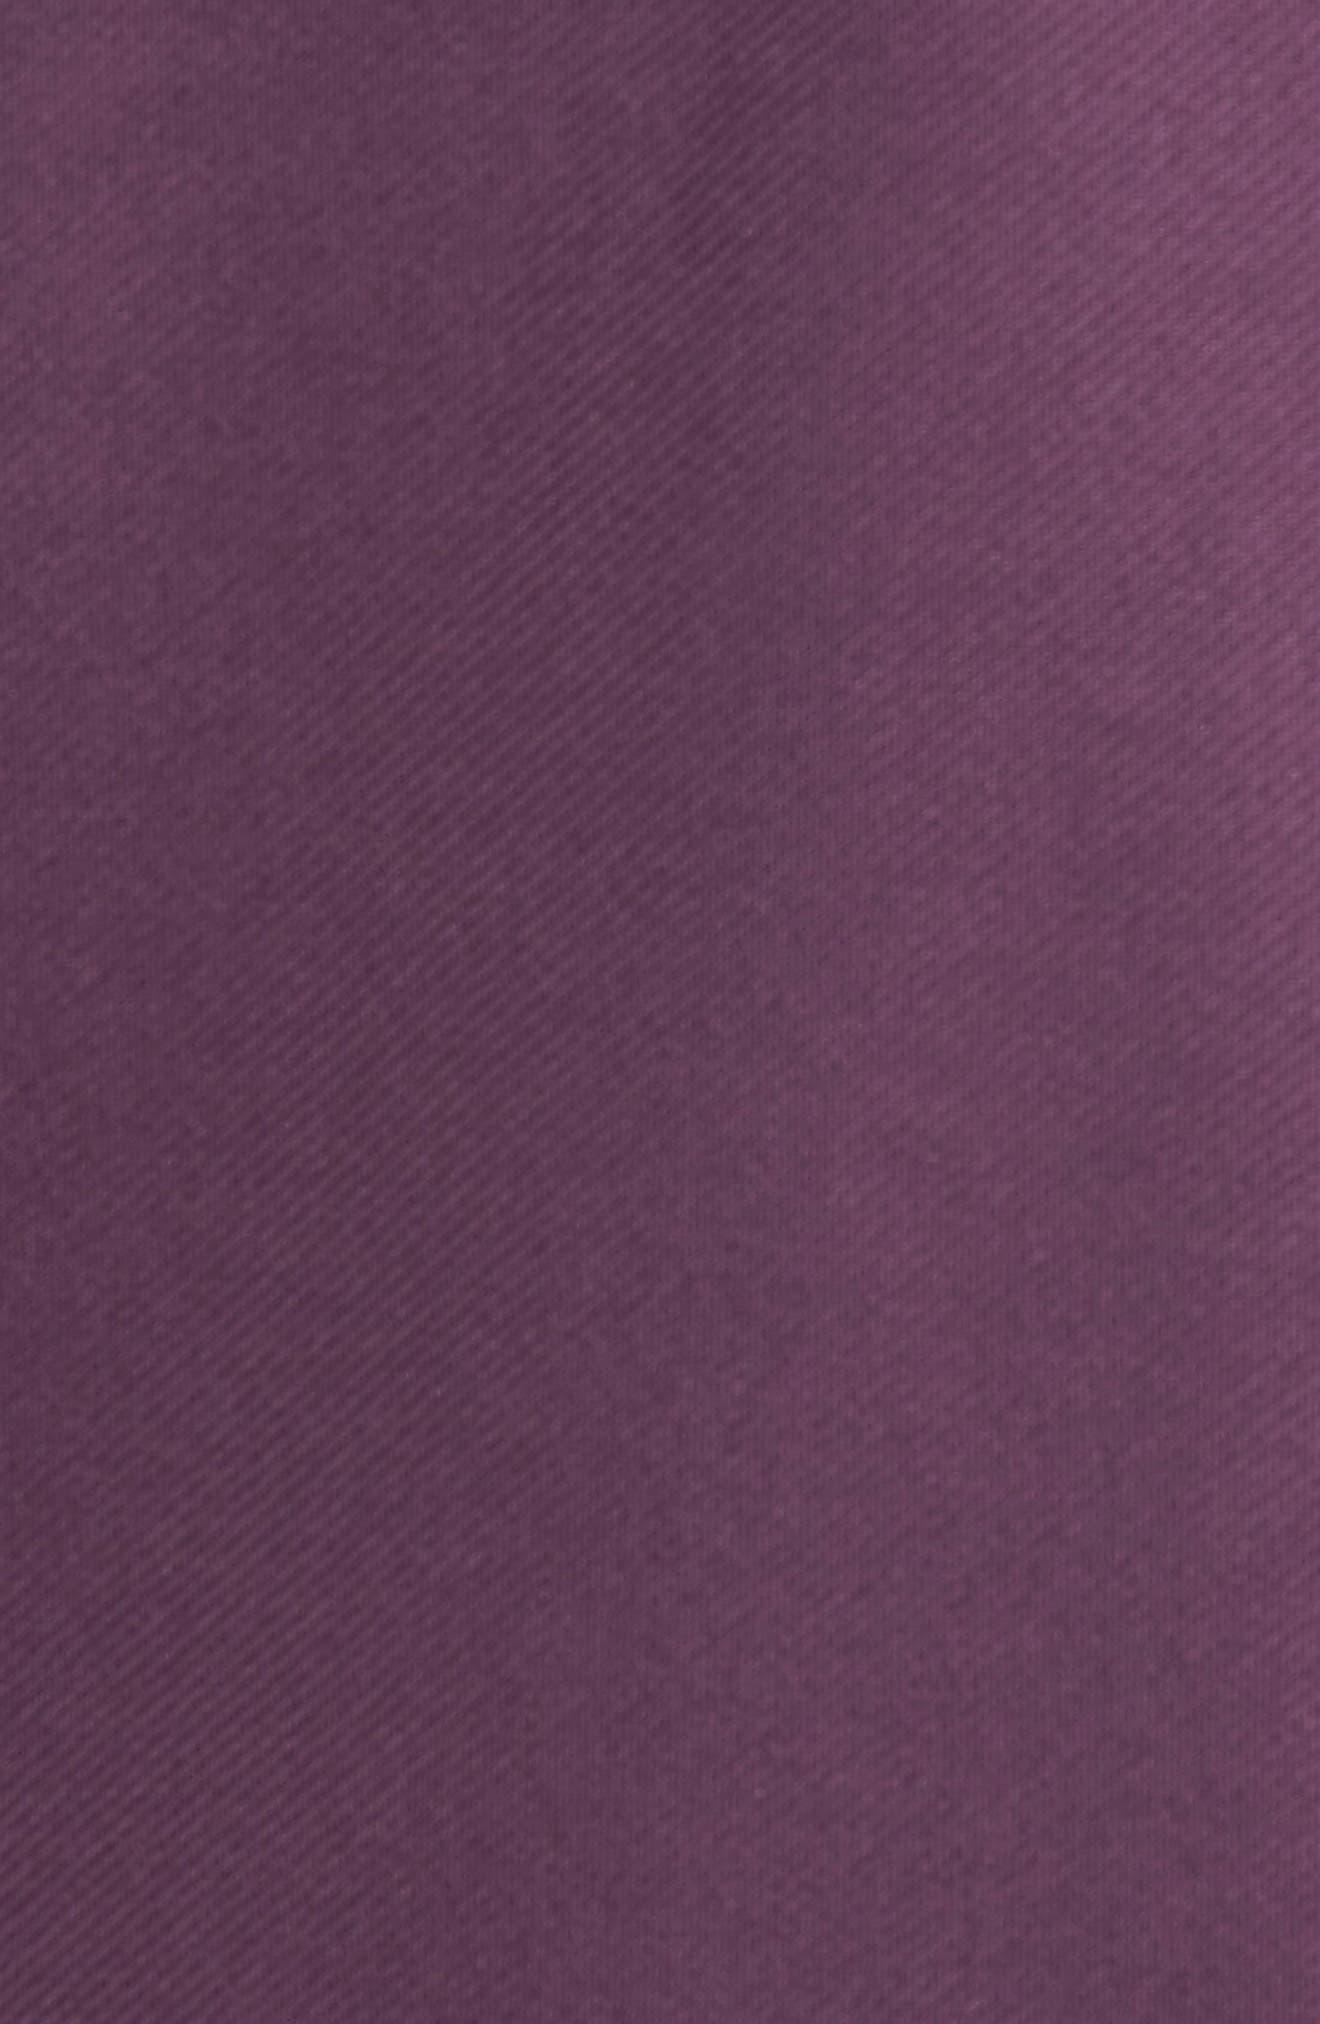 XH20 Banded Bottom Pullover,                             Alternate thumbnail 5, color,                             Blackberry